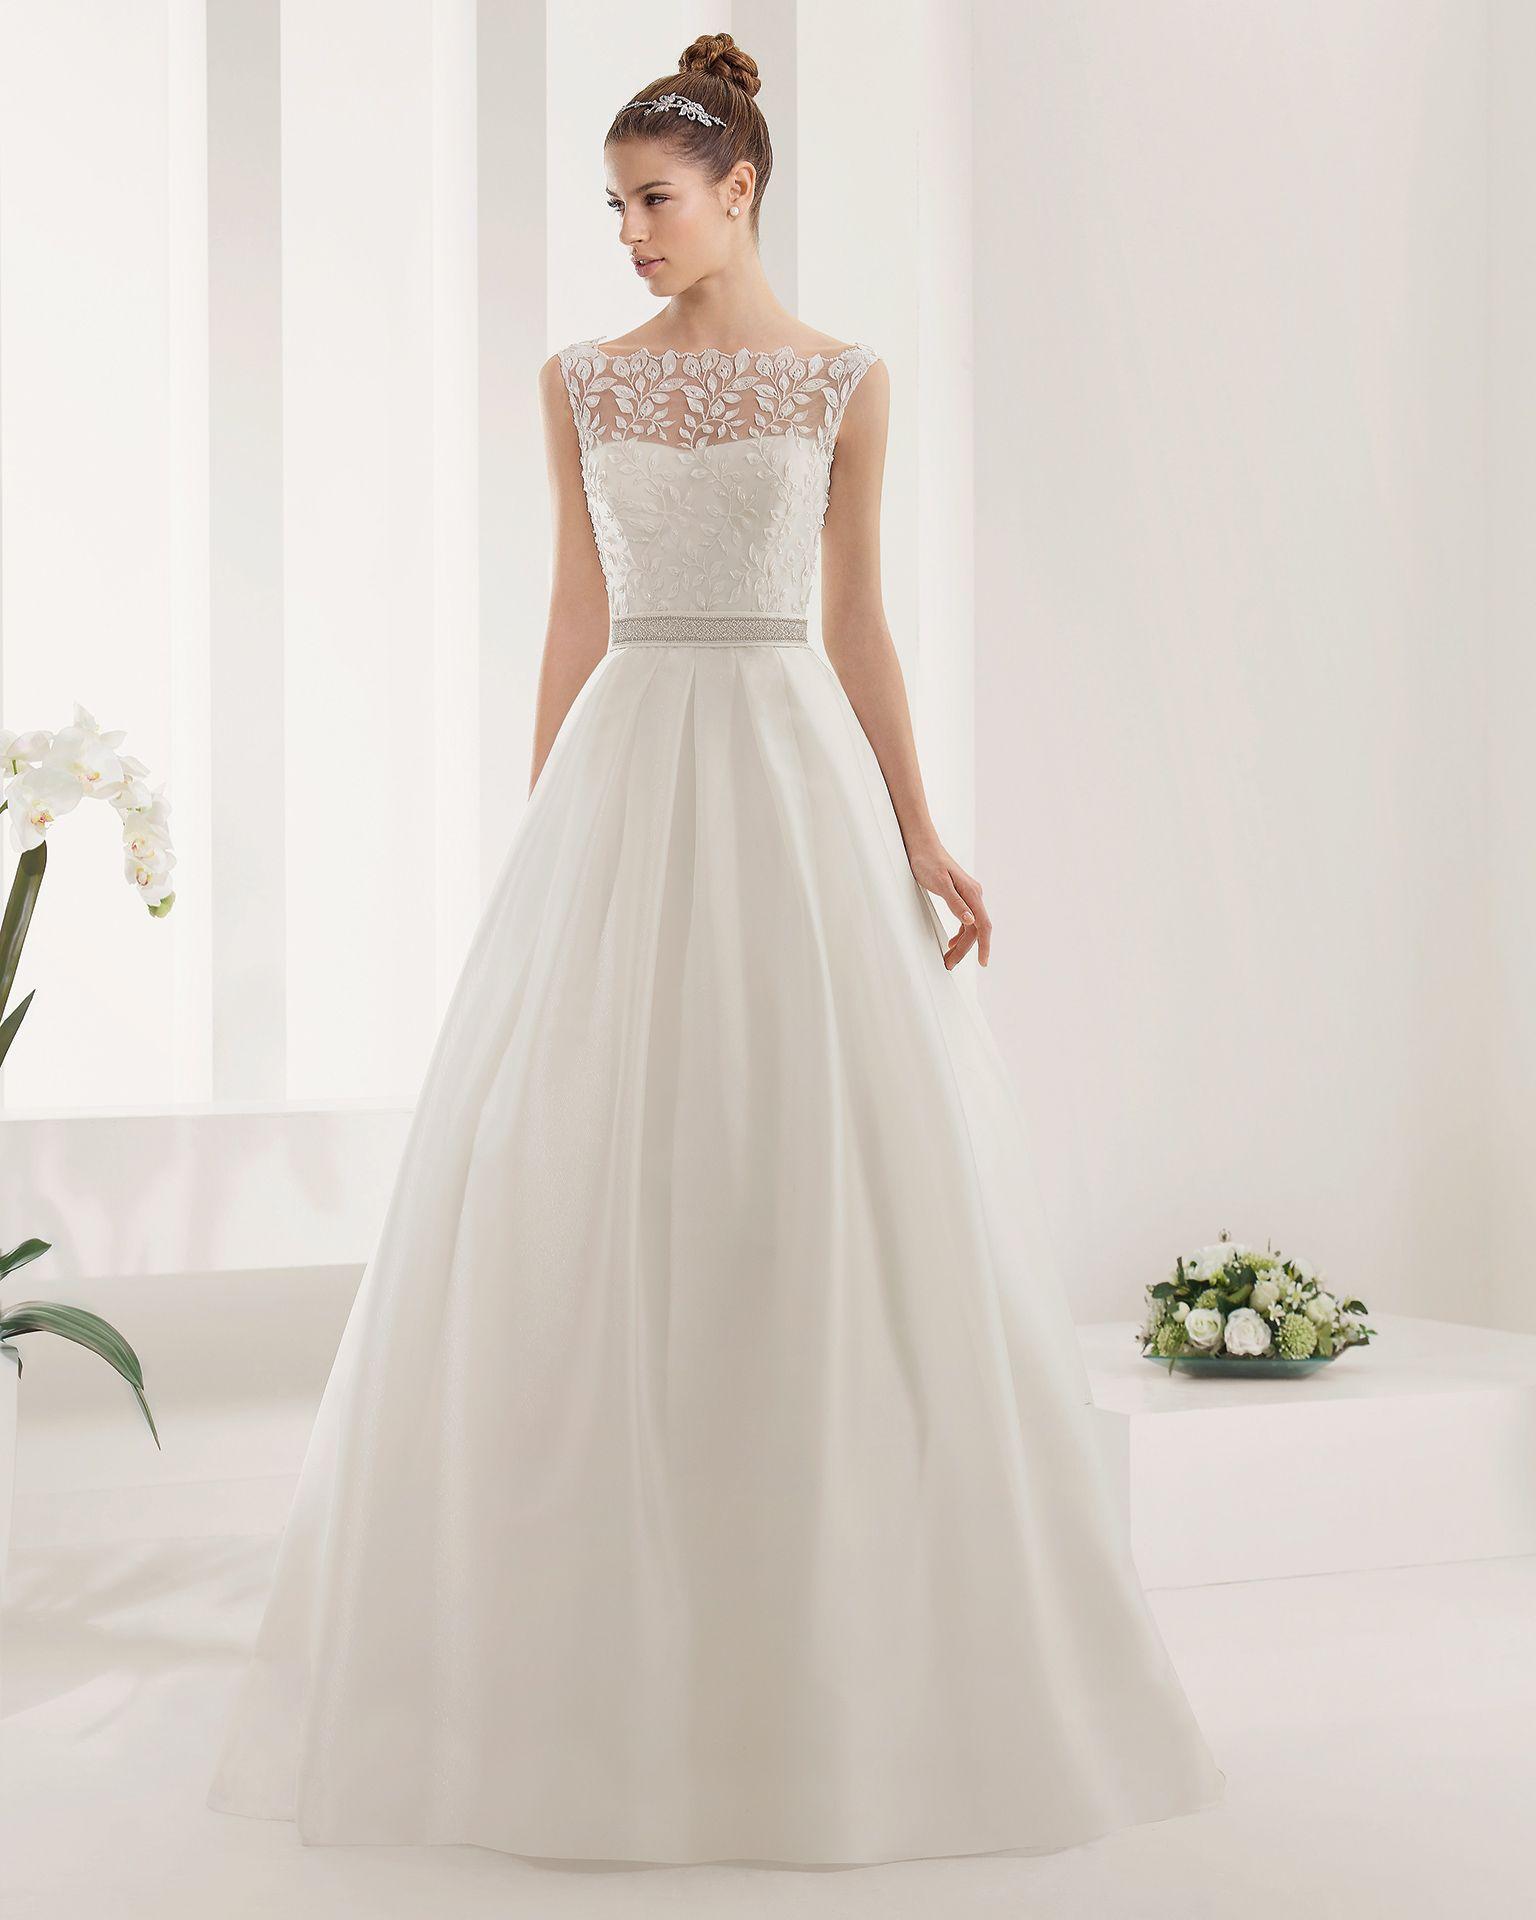 8B173 PICARO ALMA NOVIA Online wedding dress, Wedding